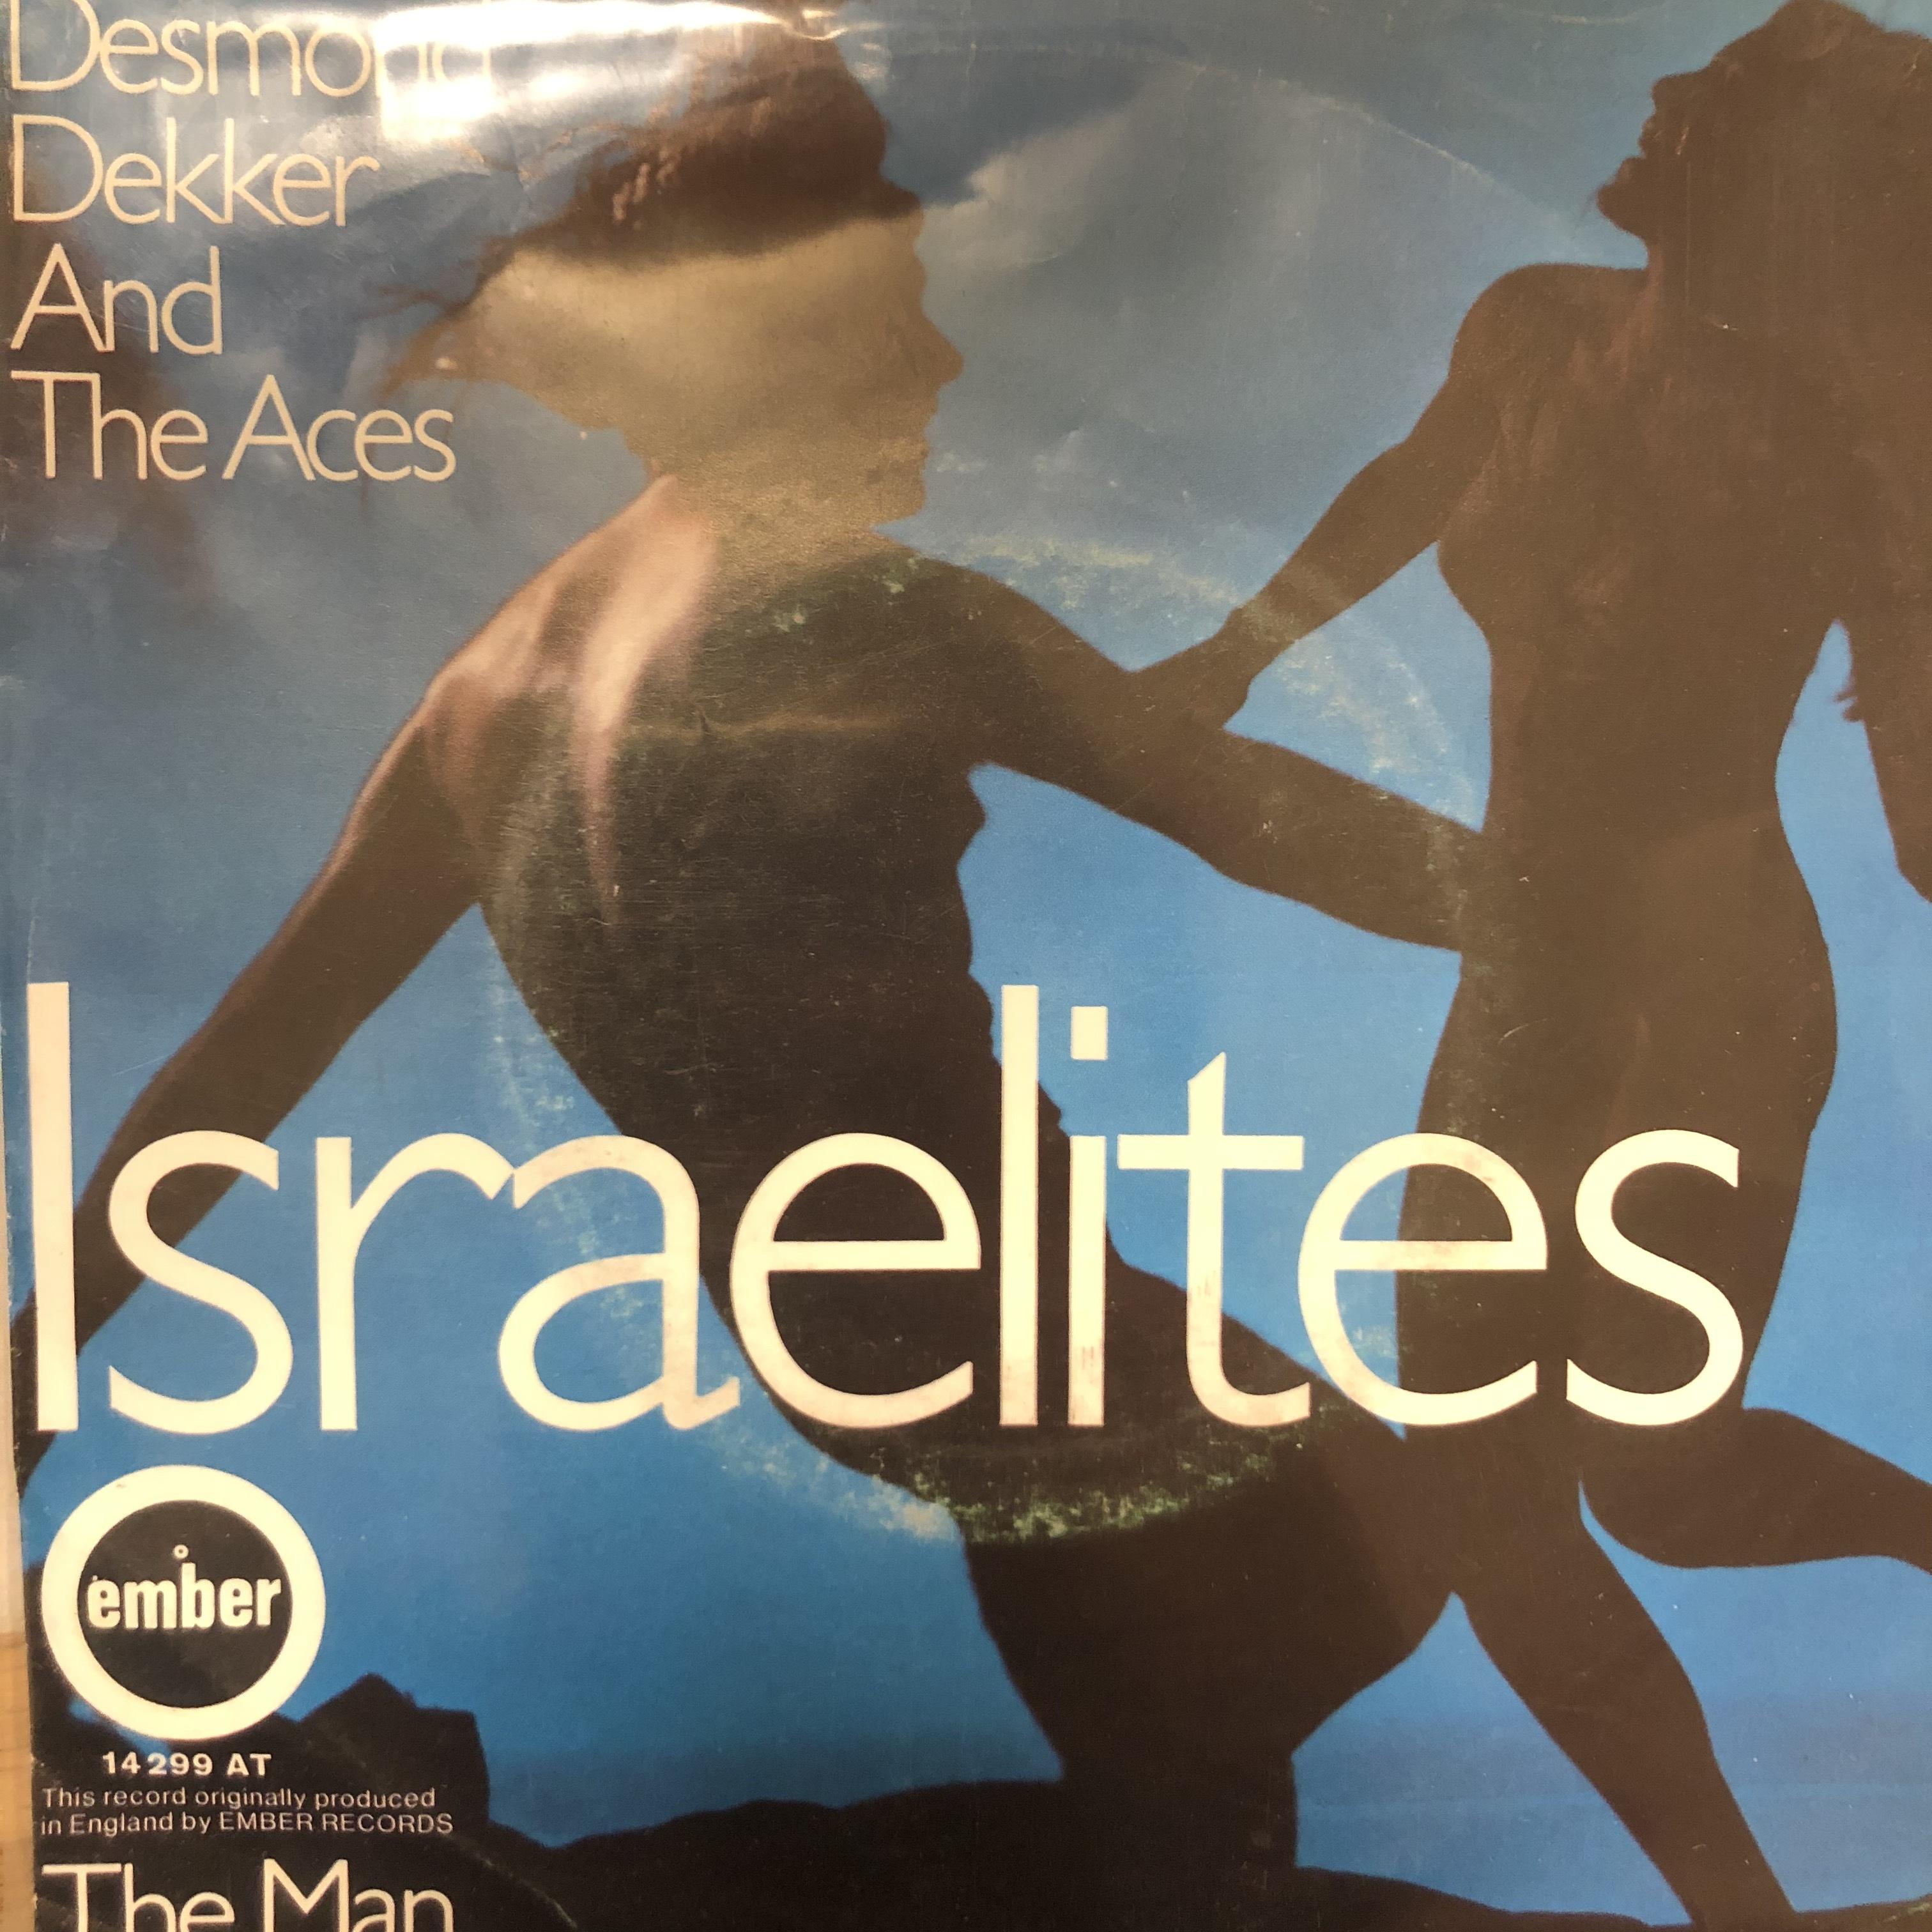 Desmond Dekker, The Aces - Israelites【7-20489】